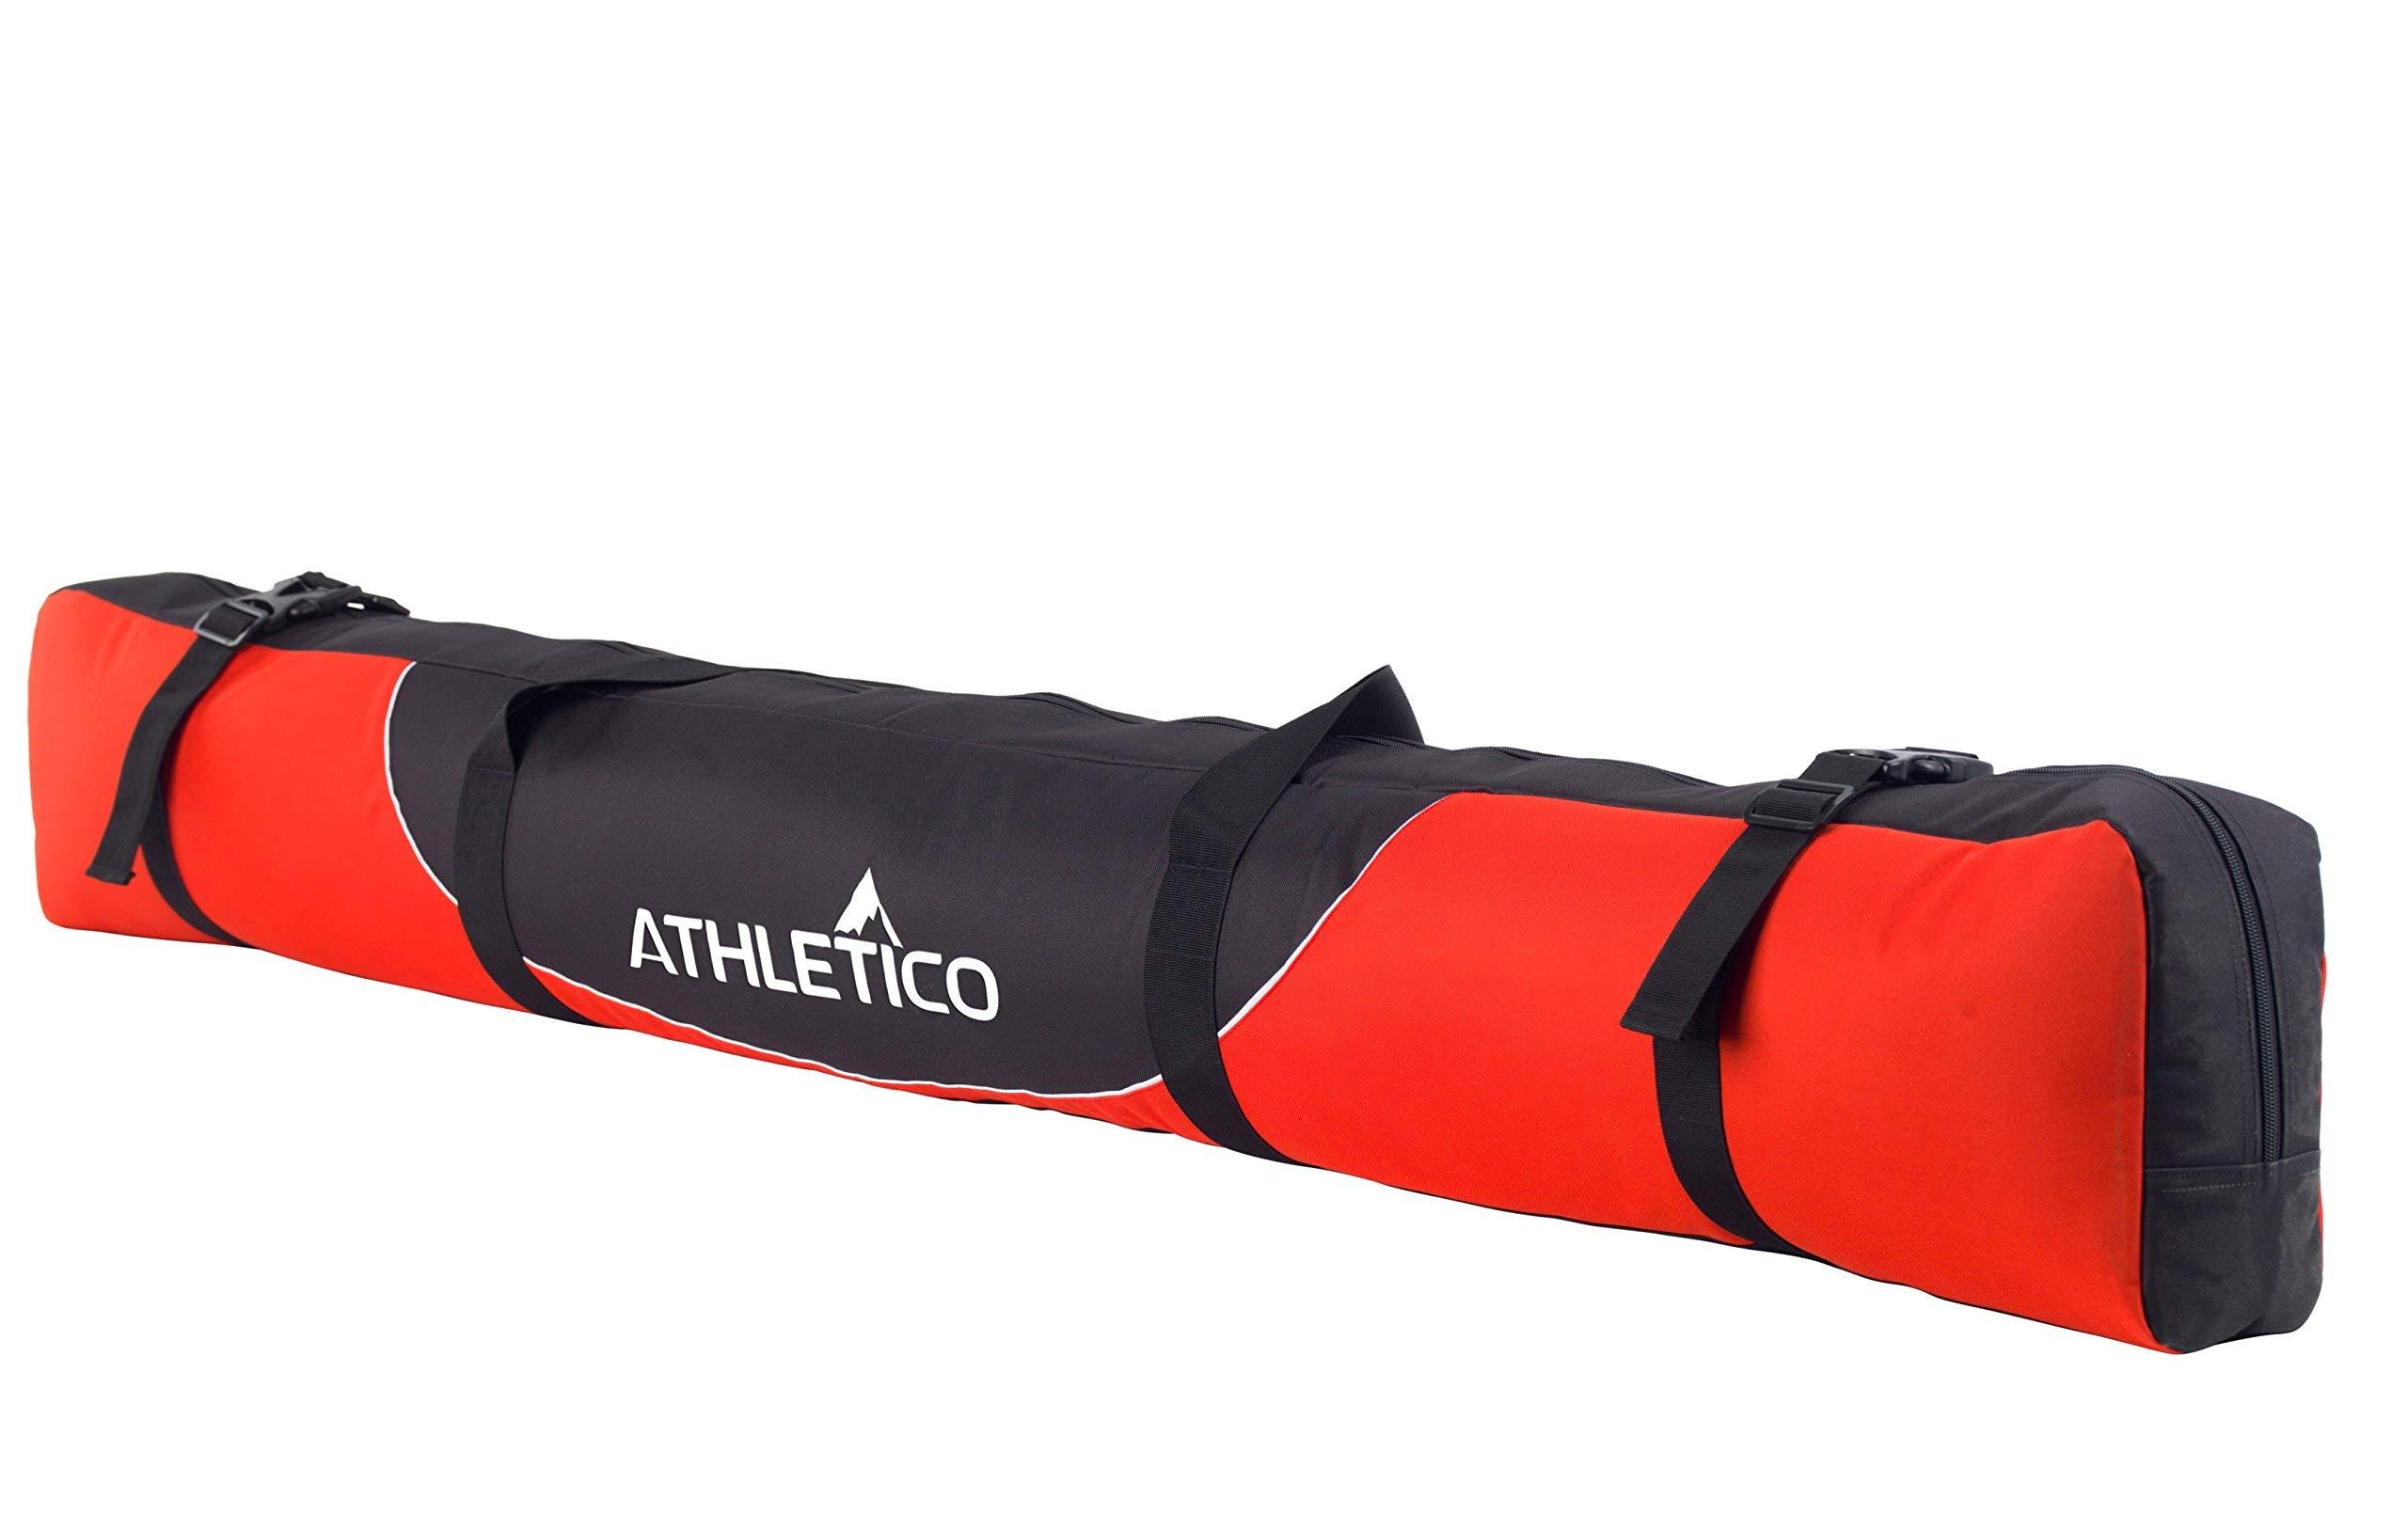 Athletico Mogul Padded Ski Bag - Fully Padded Single Ski Travel Bag (Red, 170cm) by Athletico